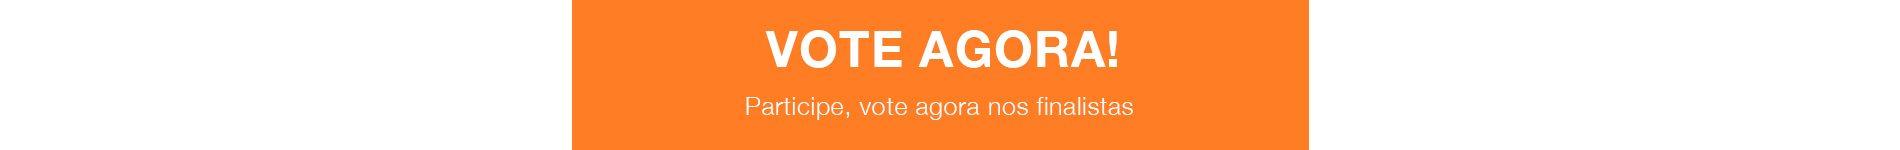 https://www.mestregp.com.br/wp-content/uploads/2017/07/botao_voteagora_1-1900x150.jpg